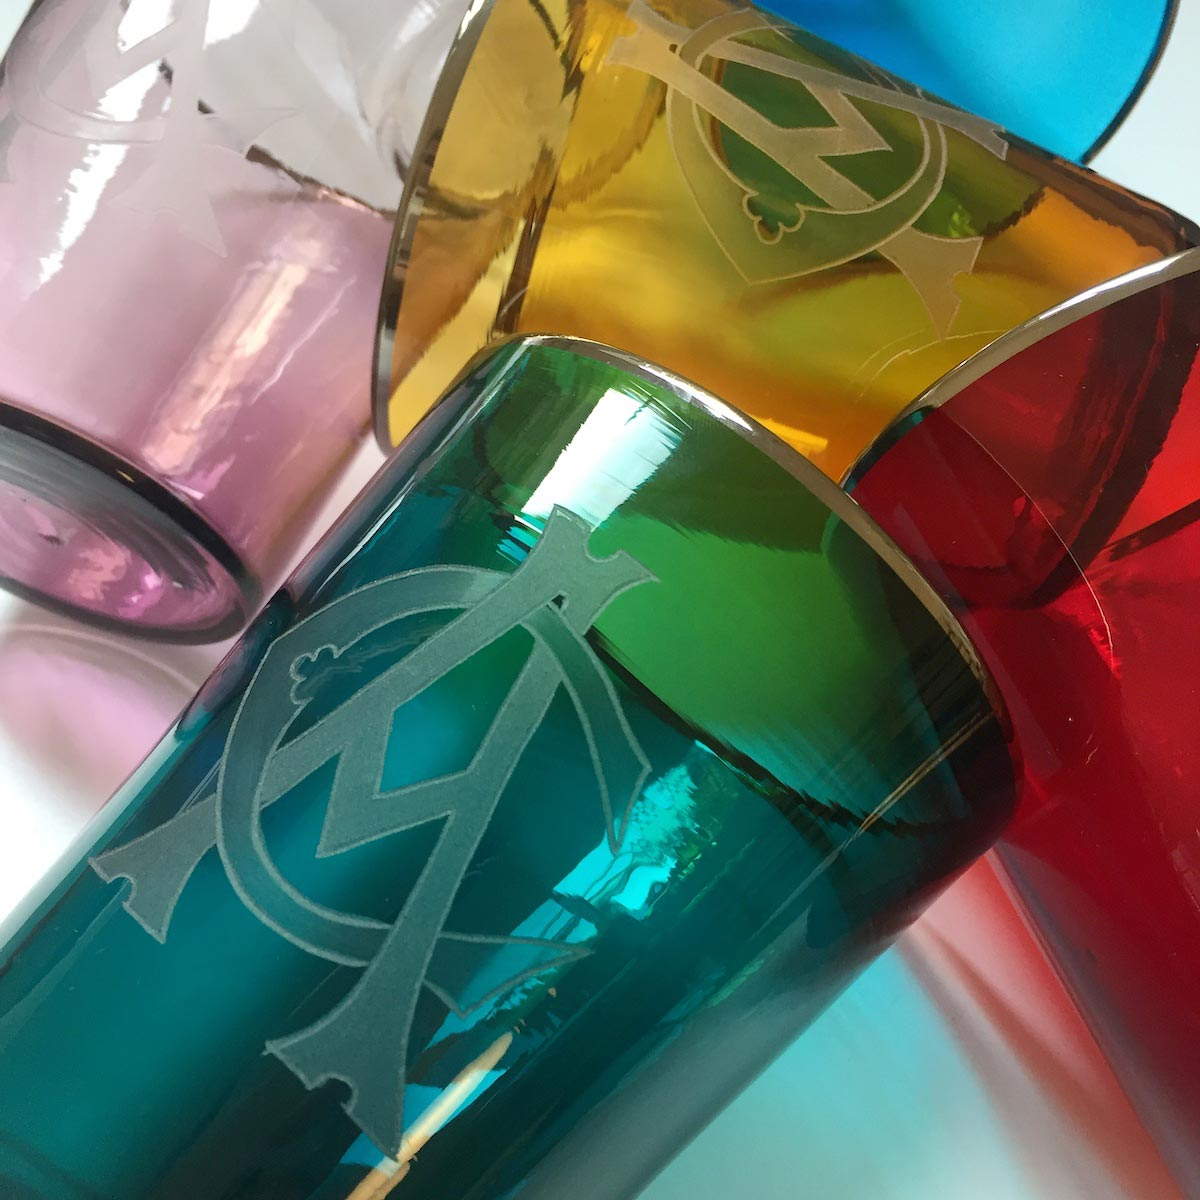 vaso-engraved-colorful-glasses-designer-monogram-initial-handmade-venice-italian